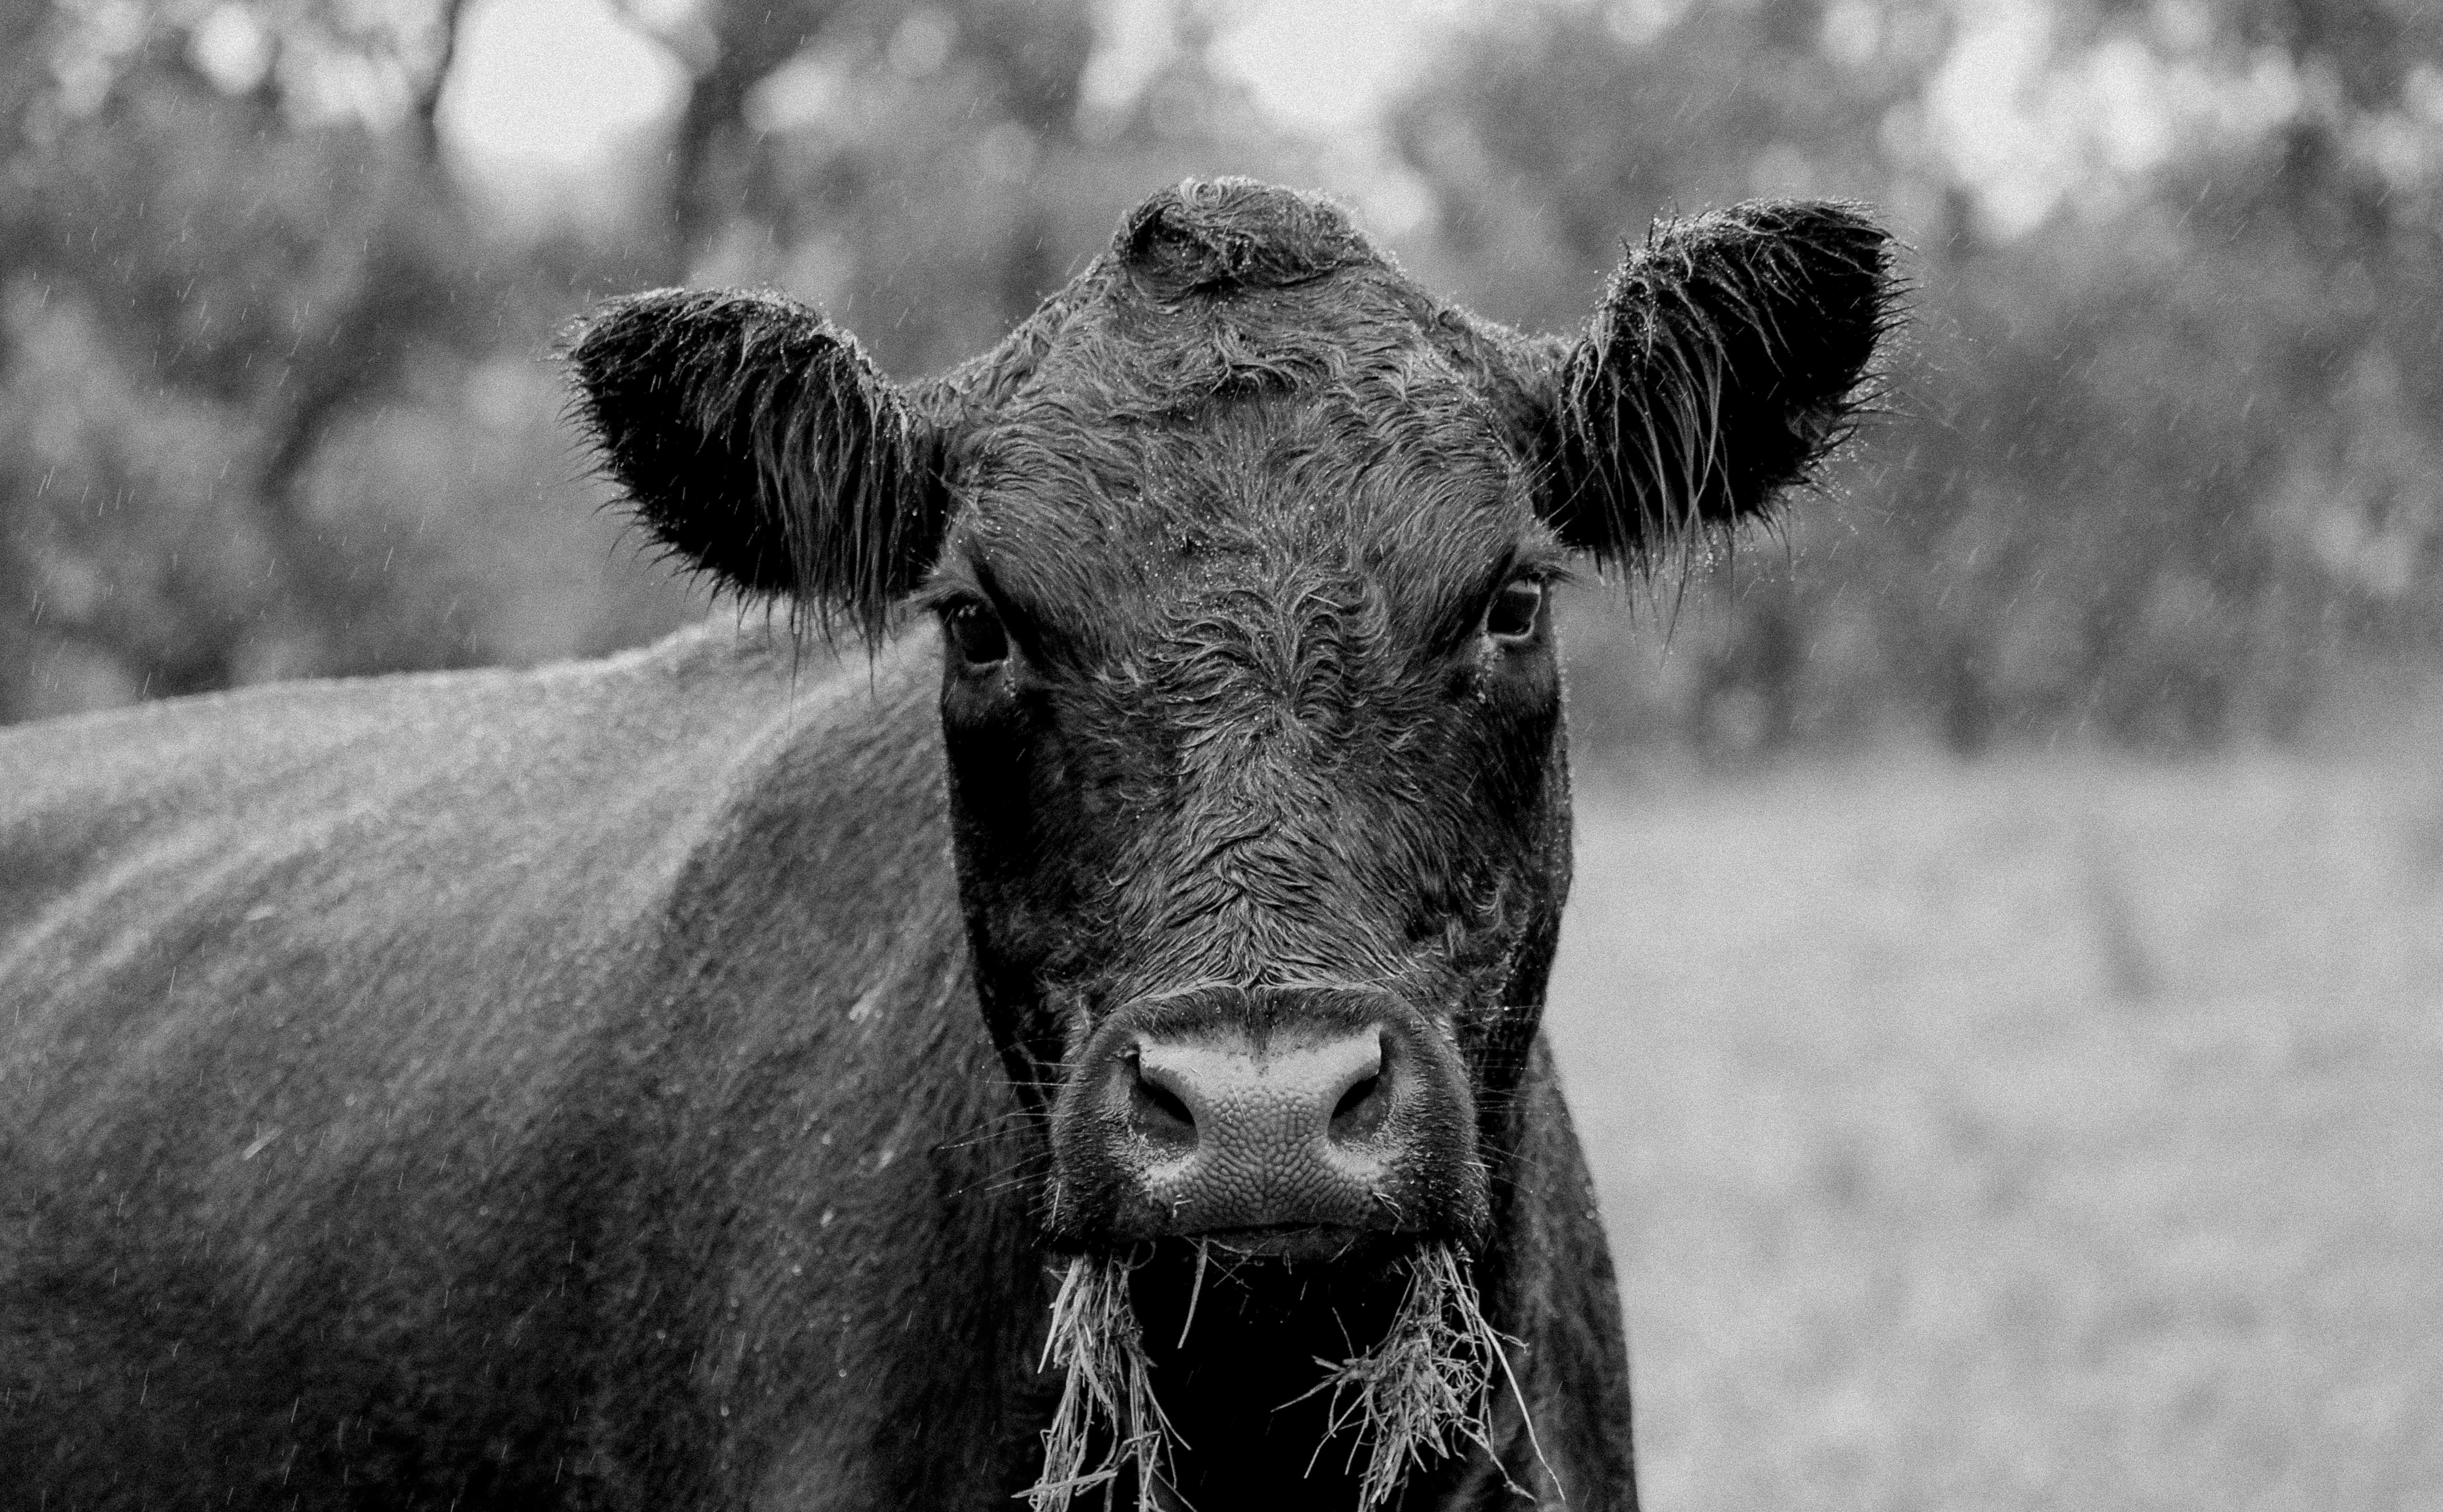 Angus cow | Lyncoranne Angus